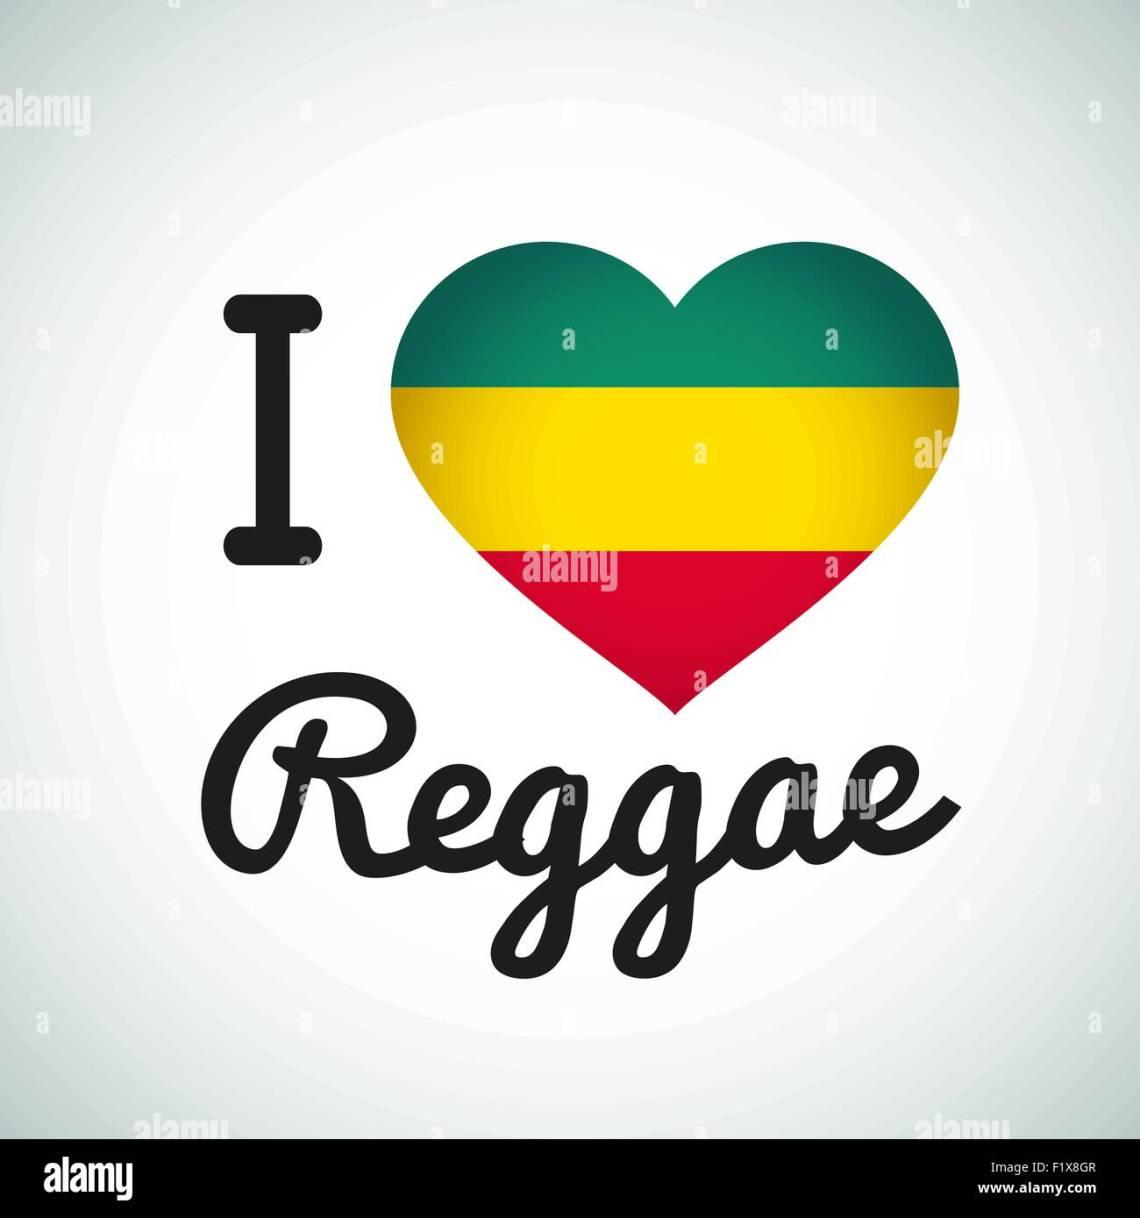 Download I love Reggae Heart illustration, Jamaican music logo ...